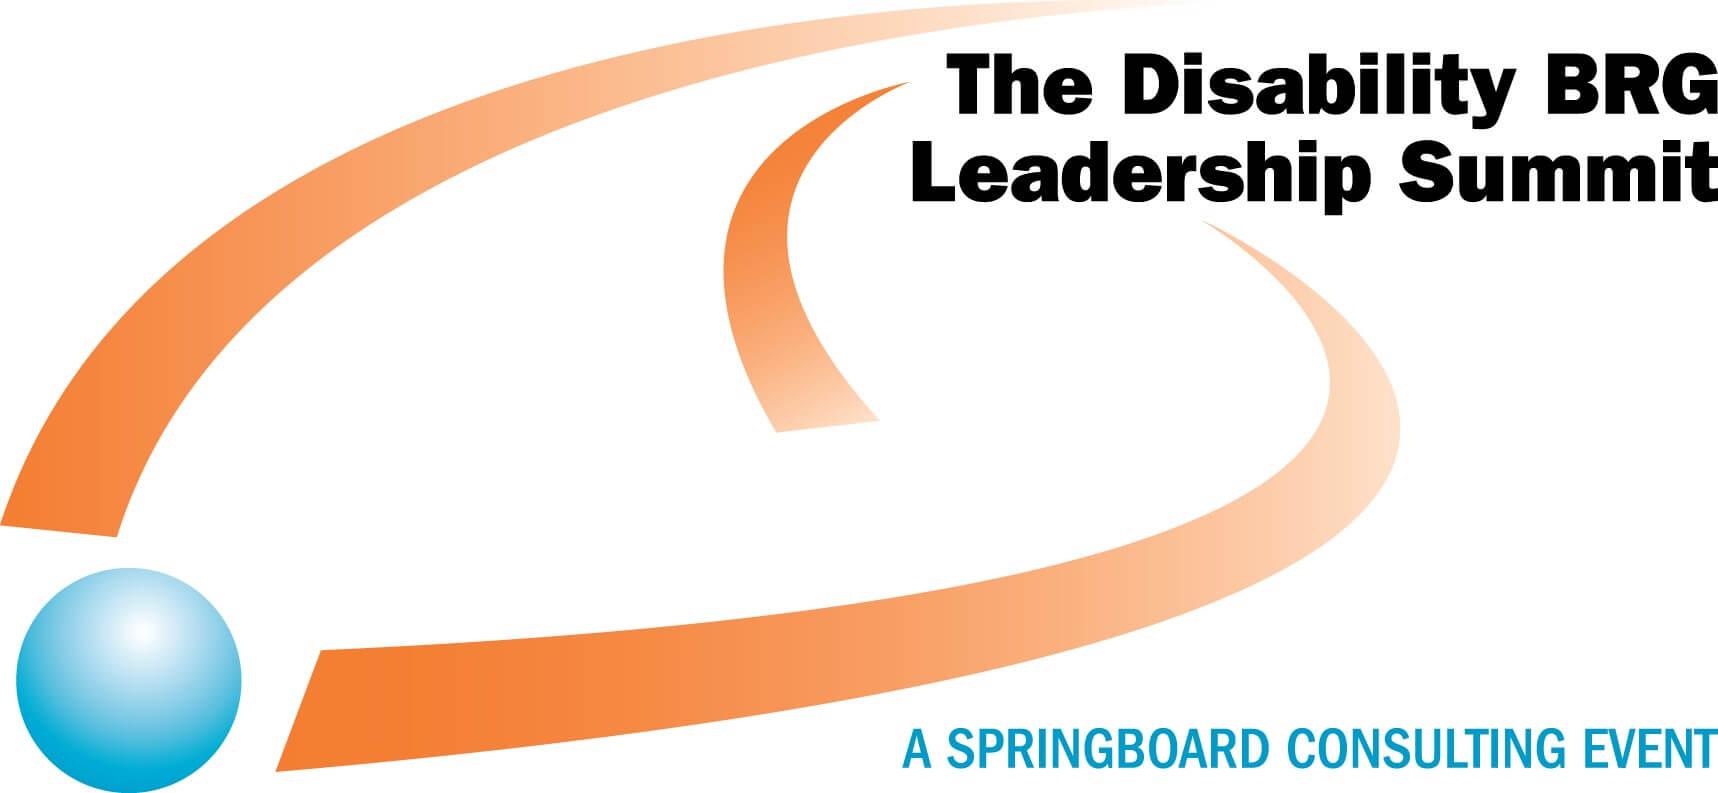 Disability BRG Leadership Summit Logo